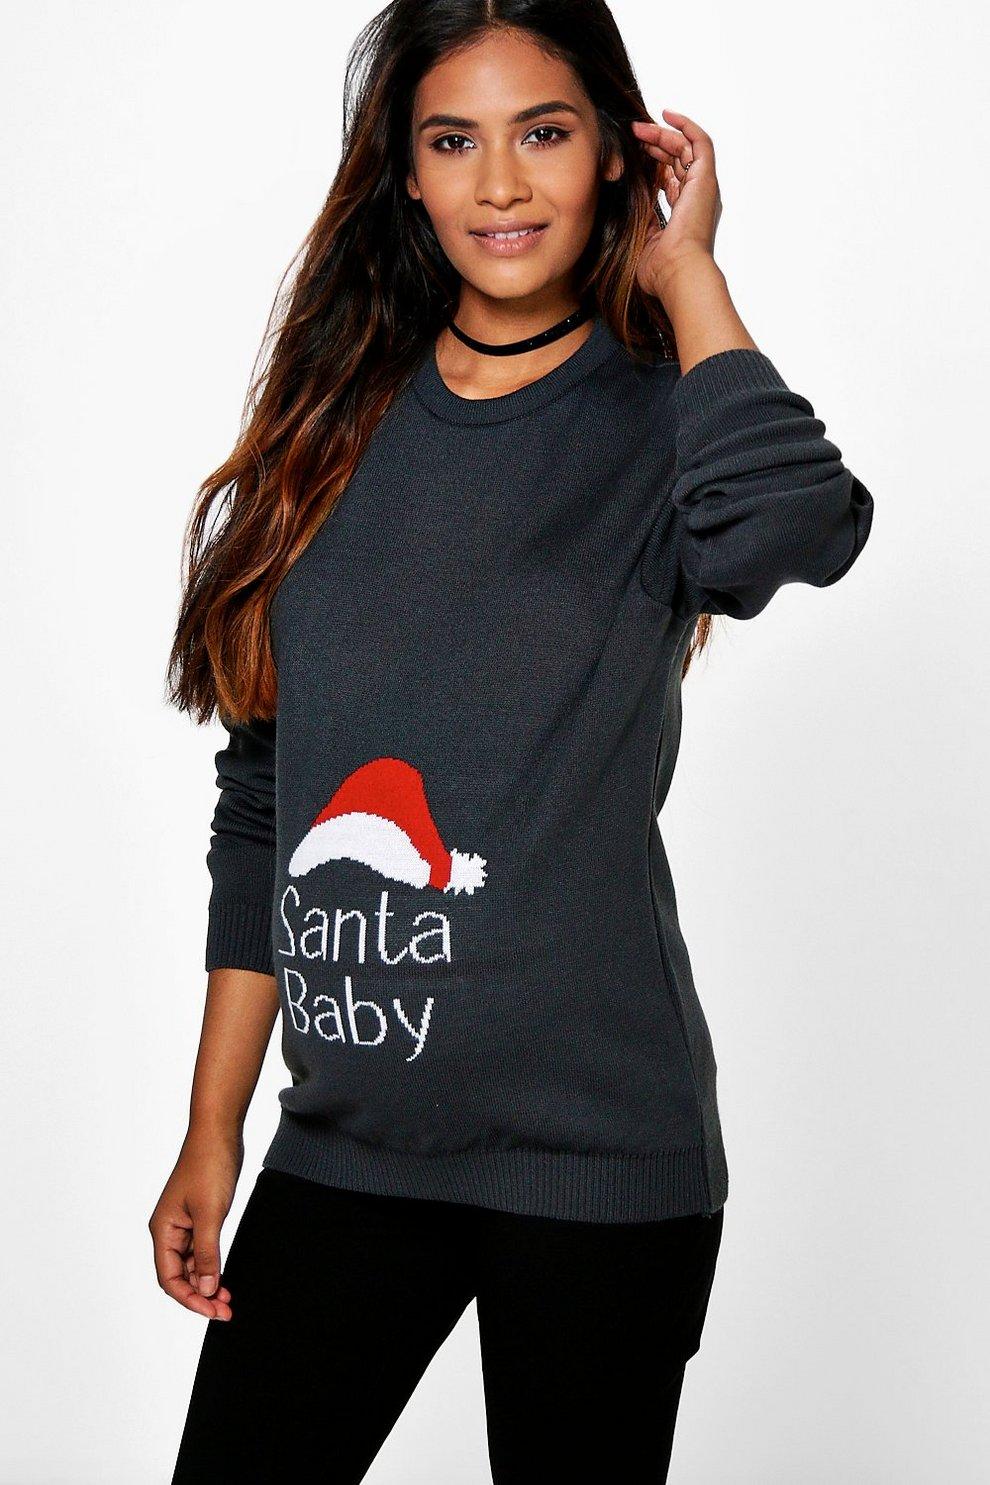 Santa Baby A Maniche Lunghe Maternit gdwLdrZ2yR